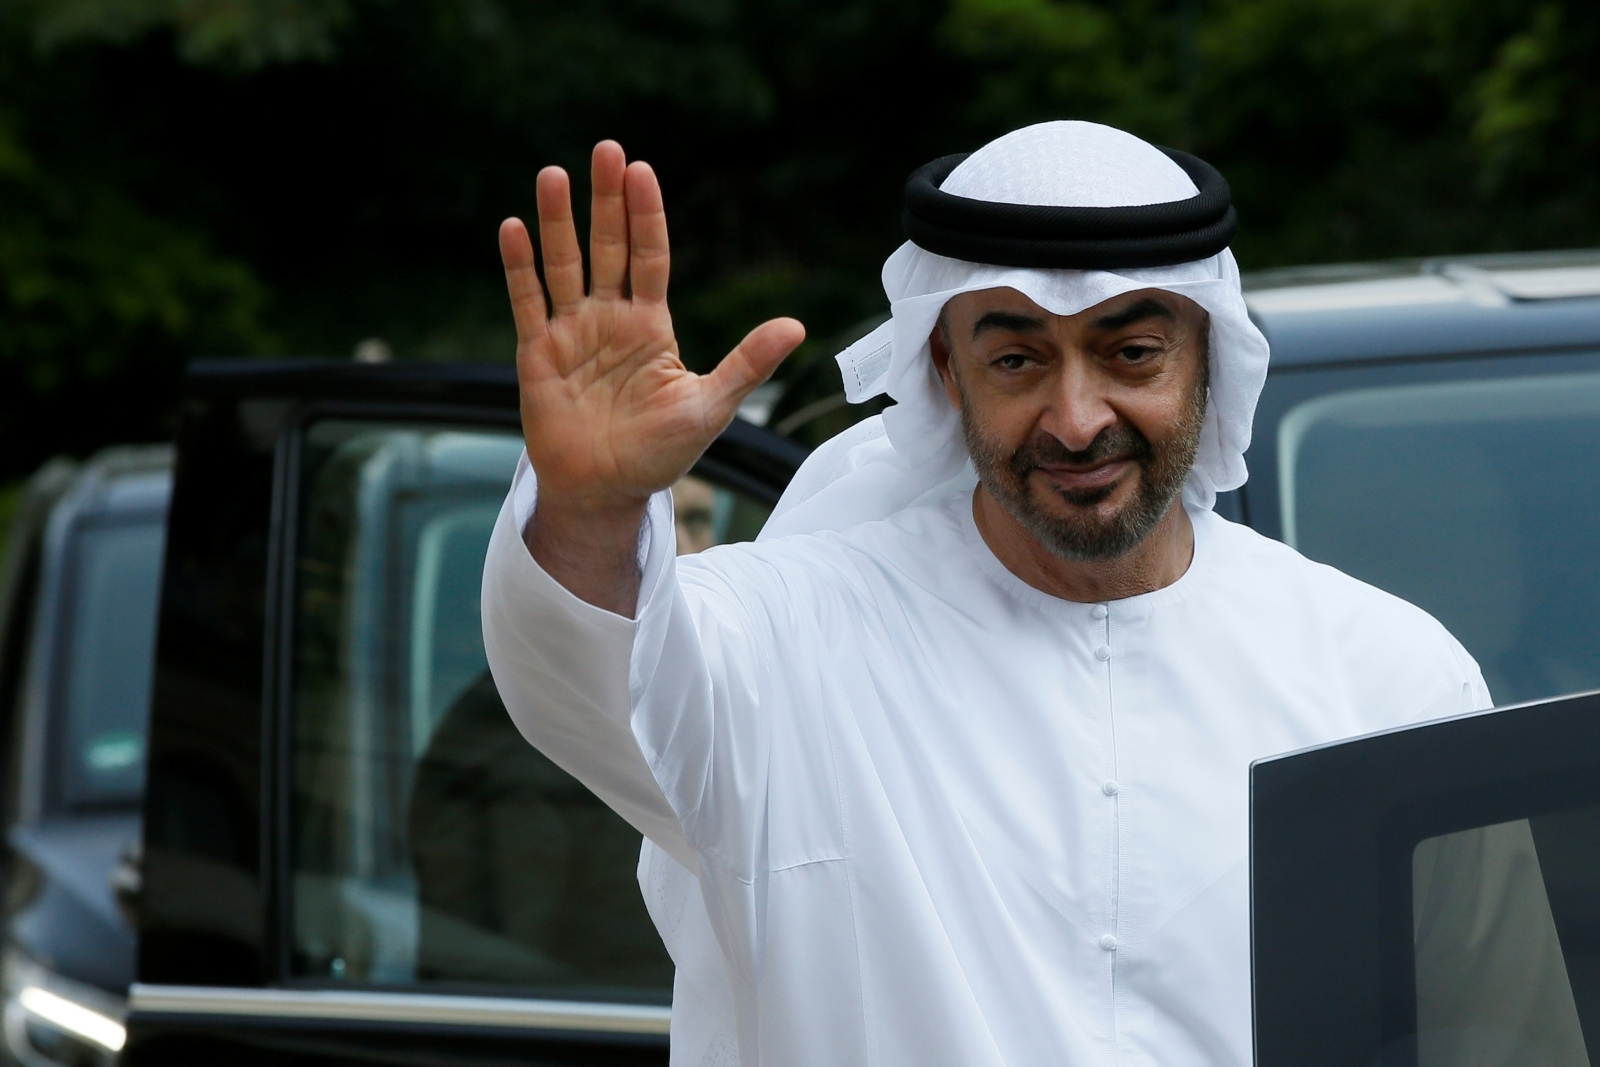 Crown Prince Sheikh Mohammed bin Zayed al-Nahyan